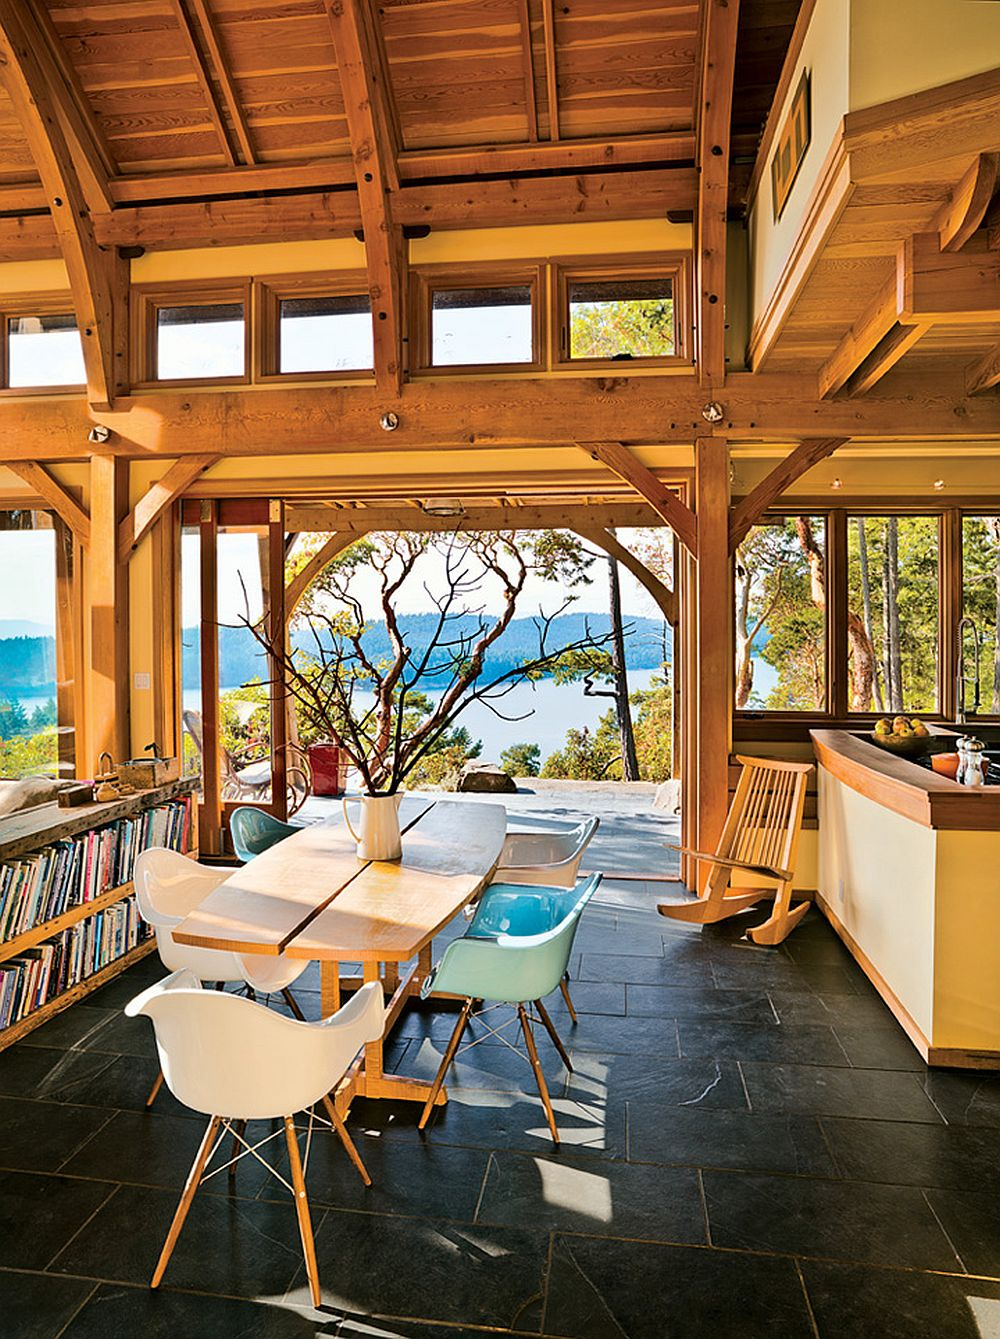 adelaparvu.com despre casa in Golf Georgia, design arh. Everest Lapp, Foto John Sinal (5)